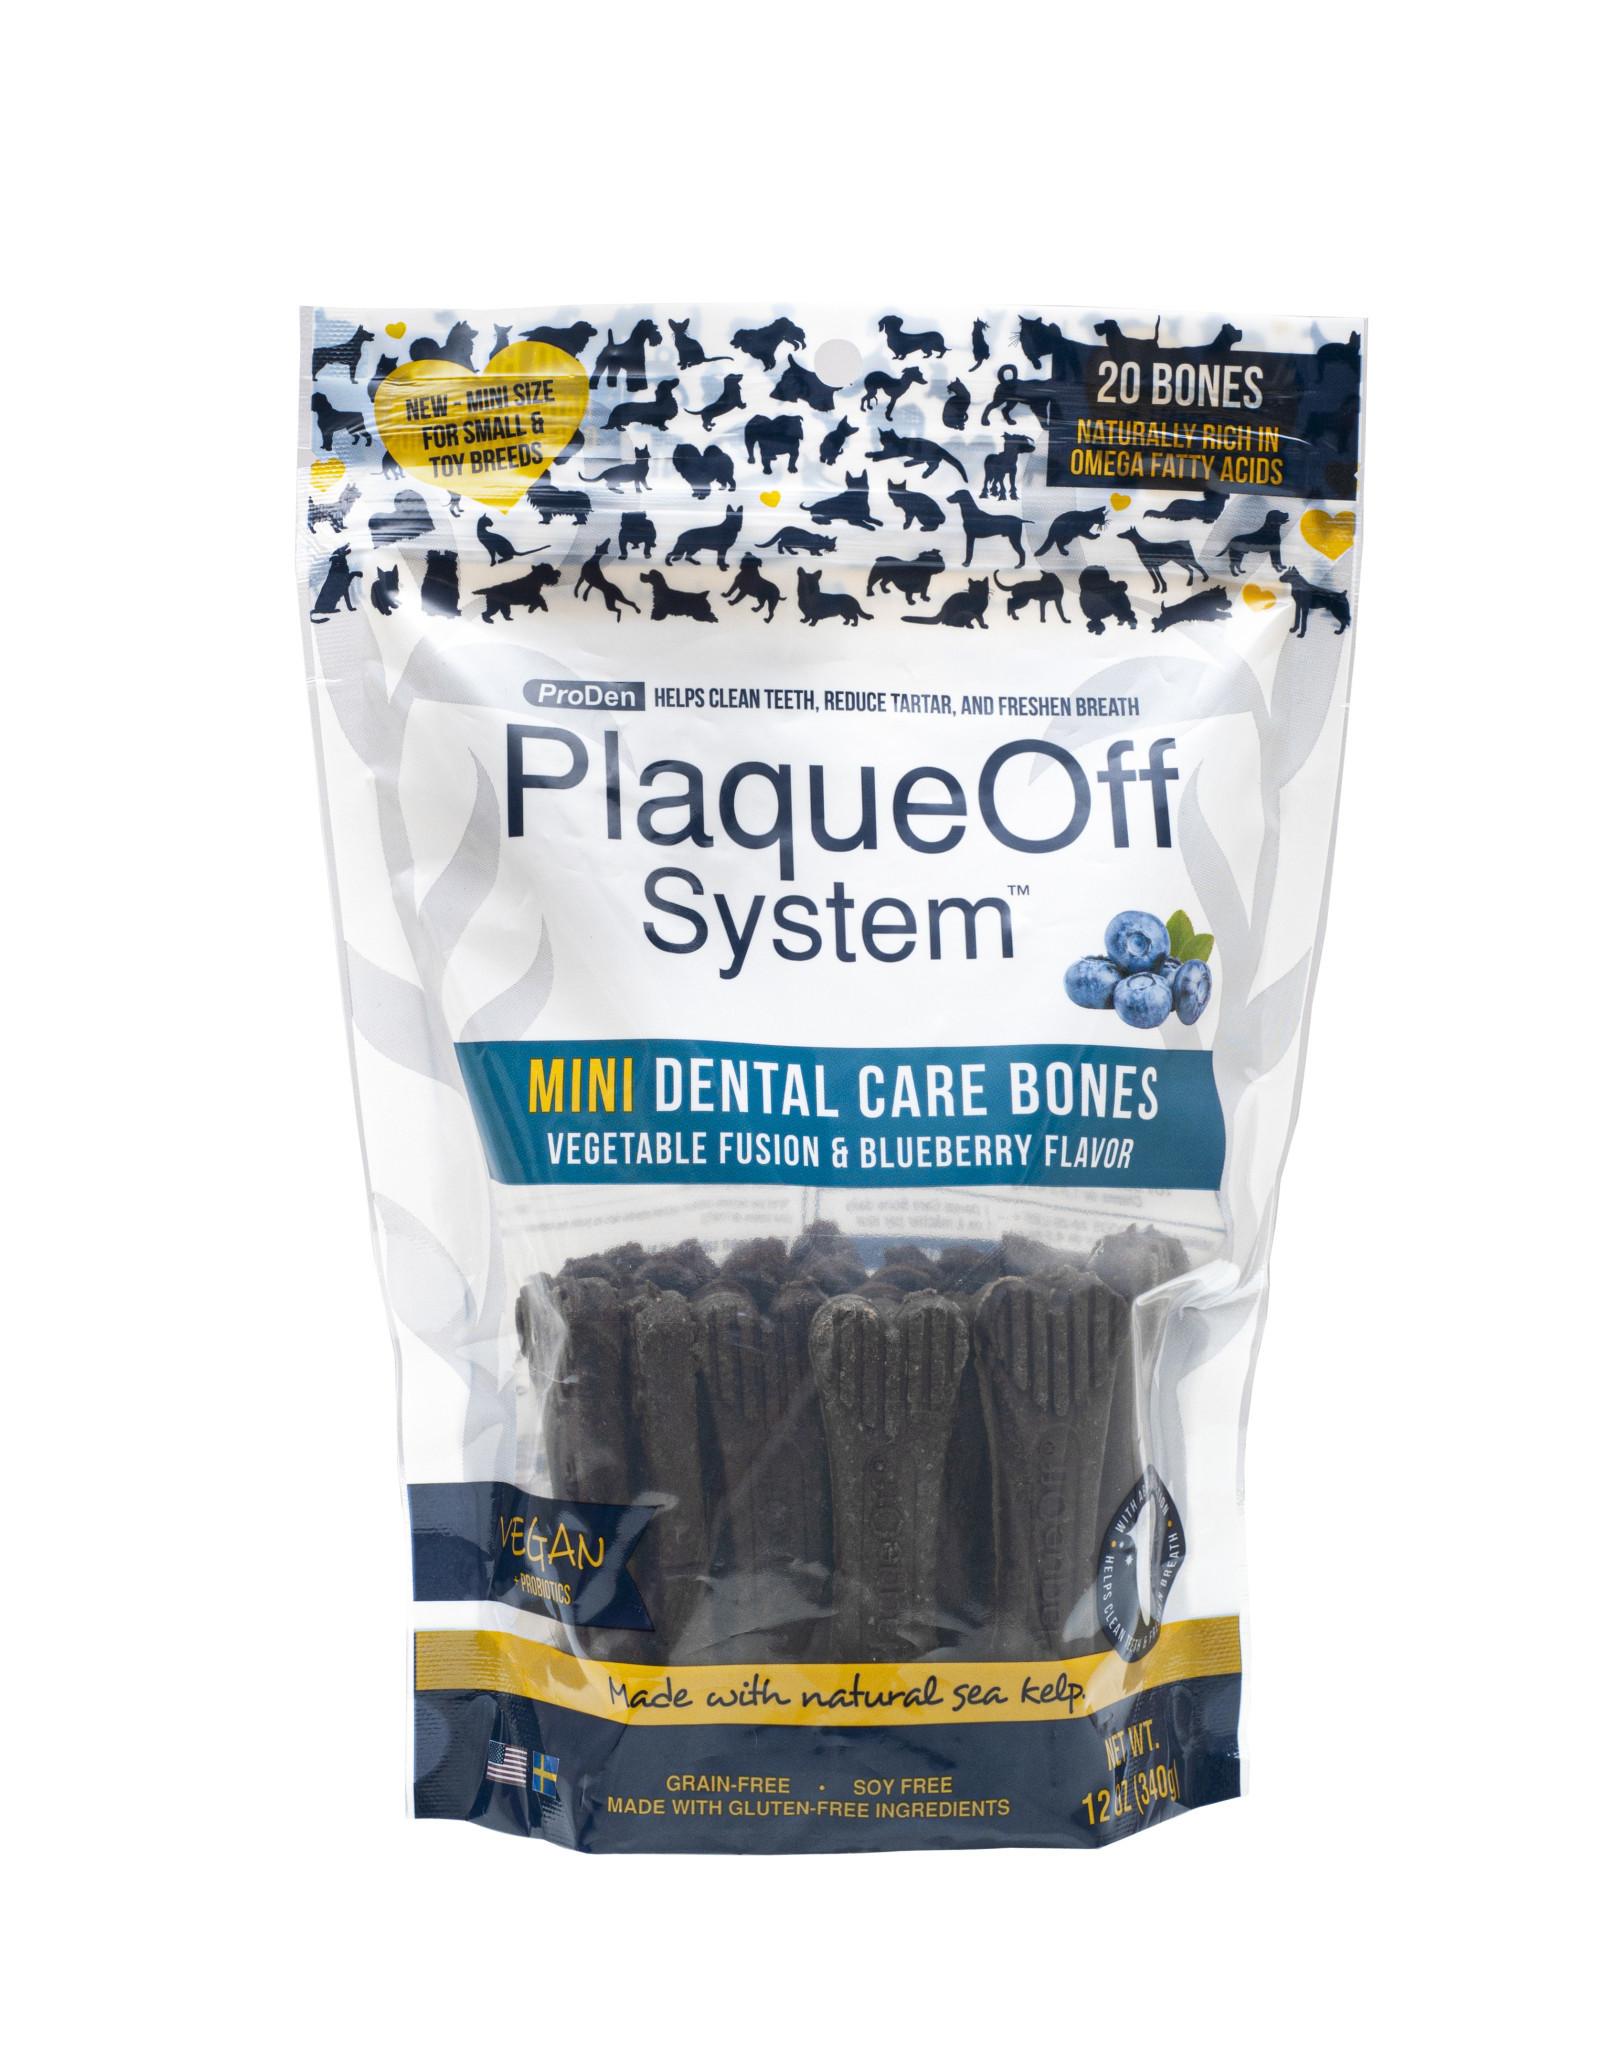 Plaque Off Veg Fusion & Blueberry 12oz Dental Bones